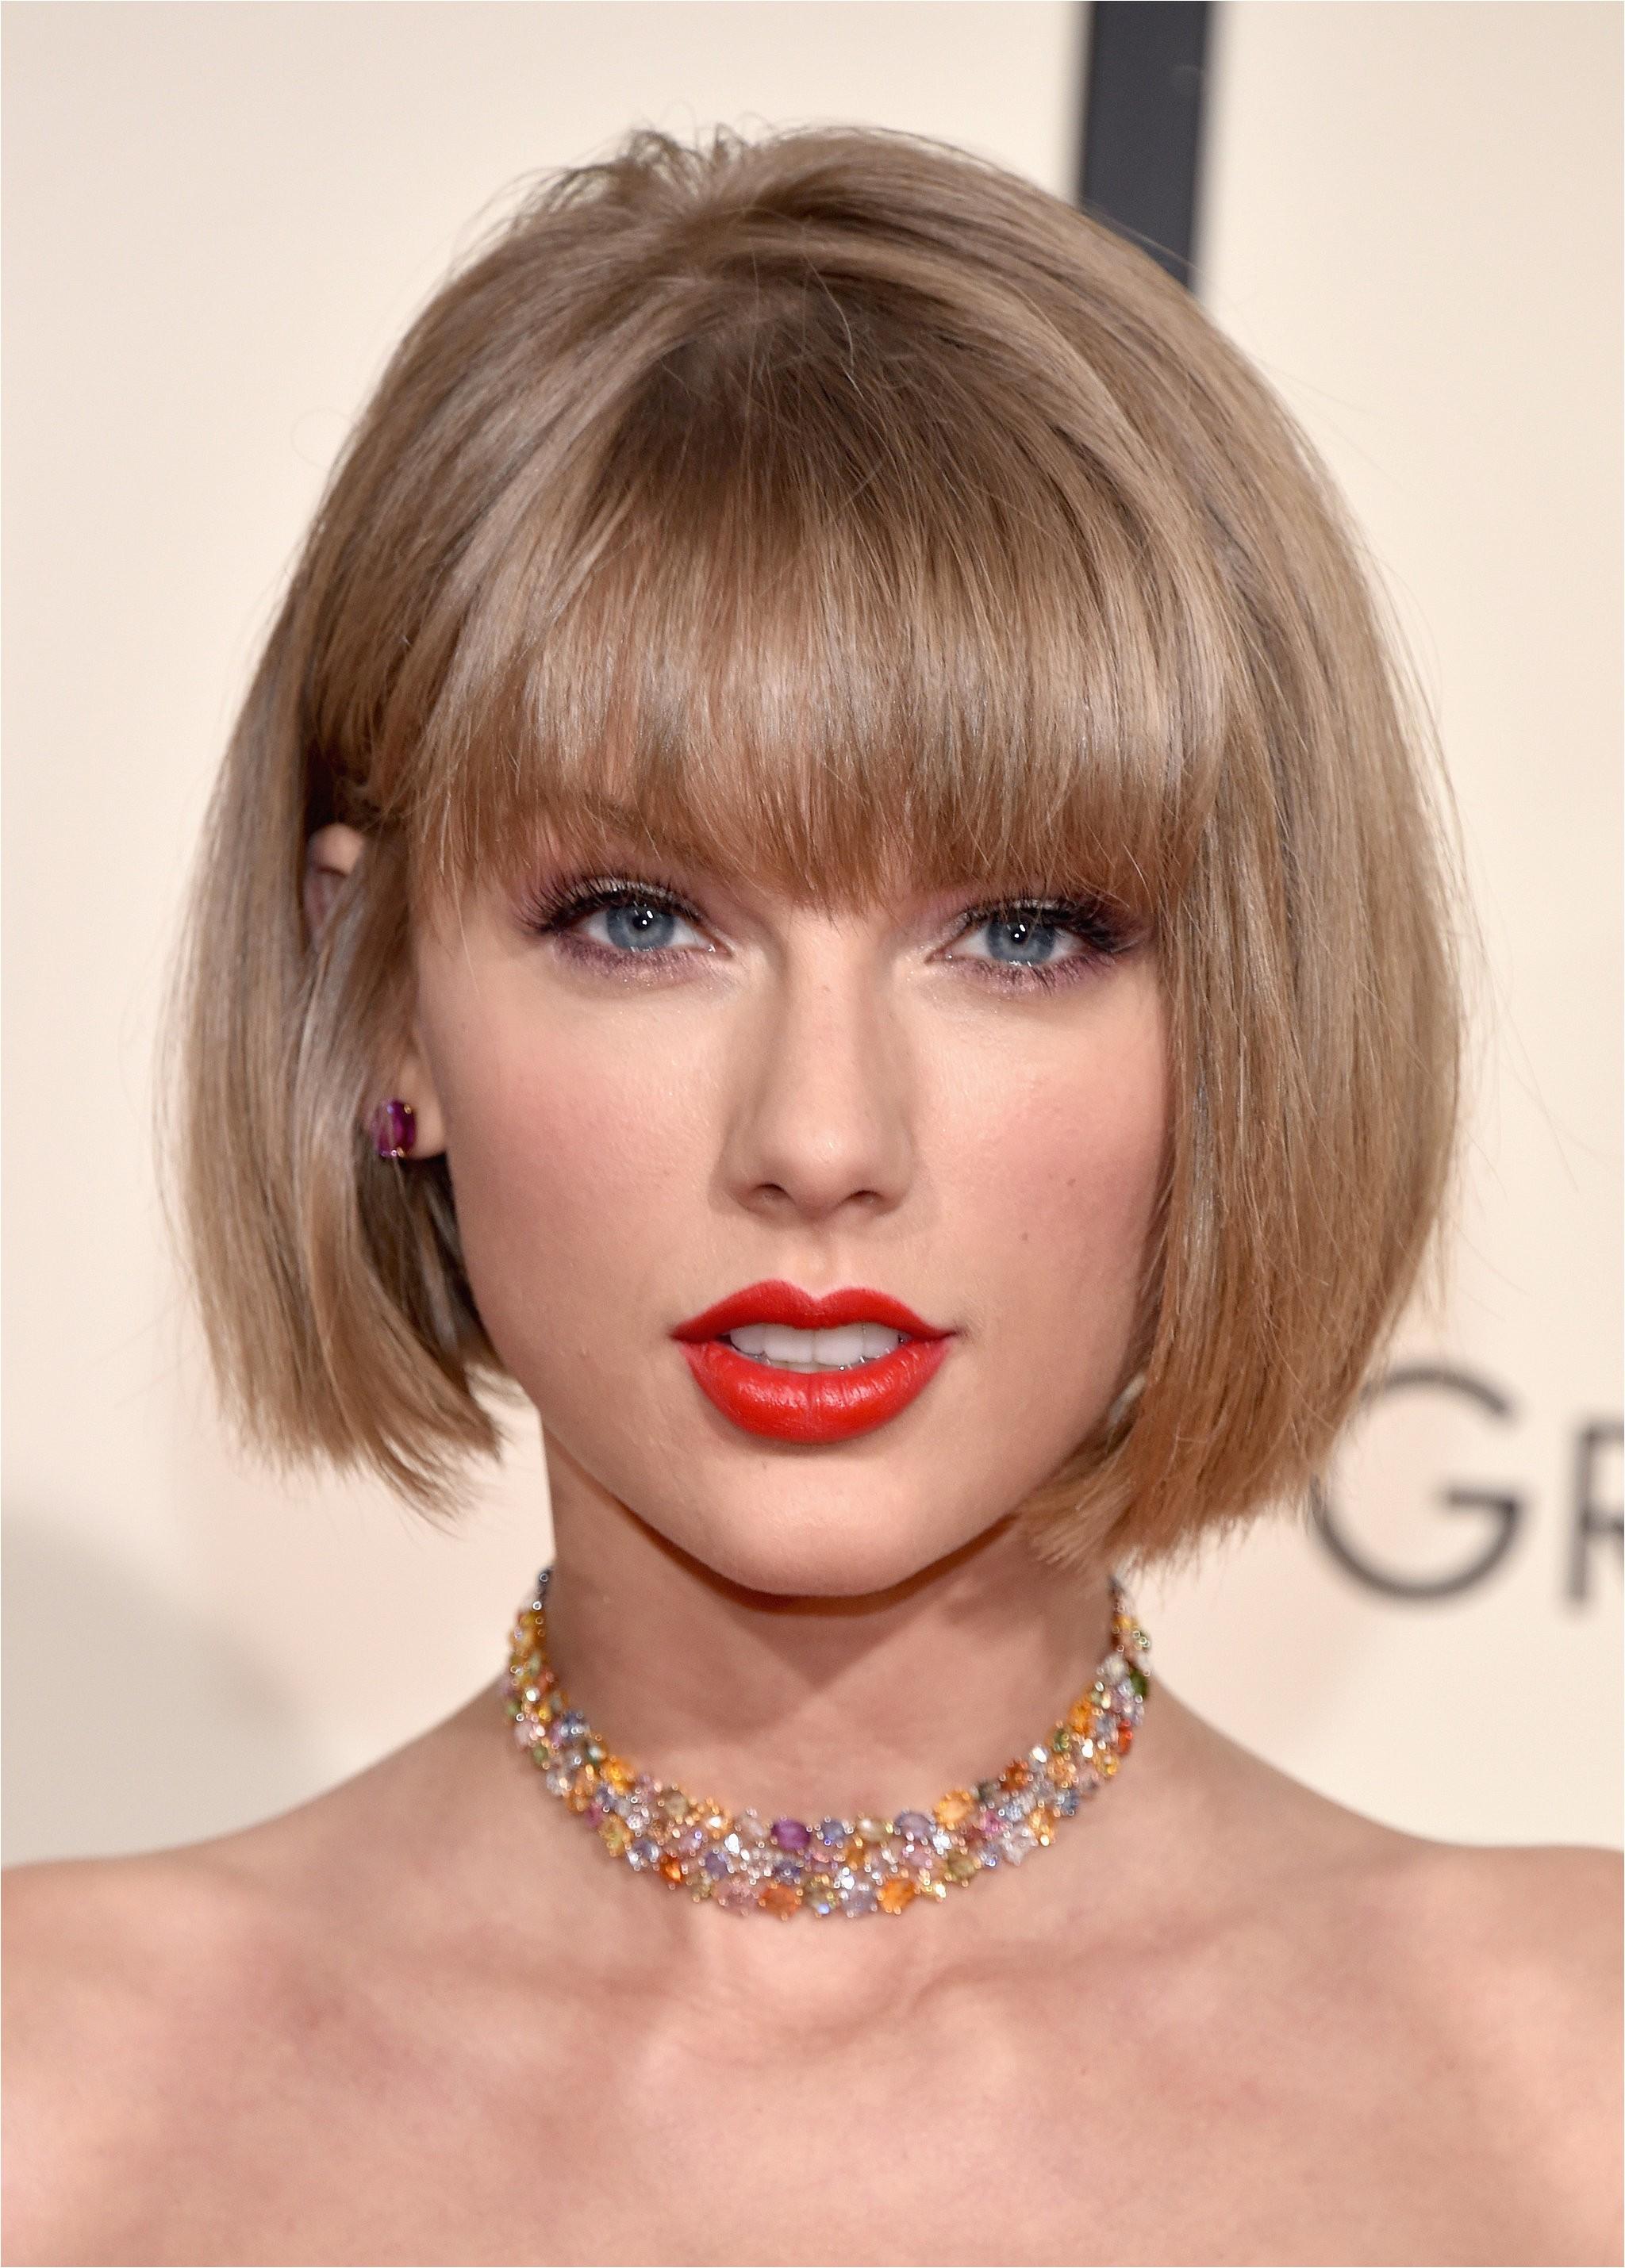 Taylor Swift Haircut Grammy Awards 2016